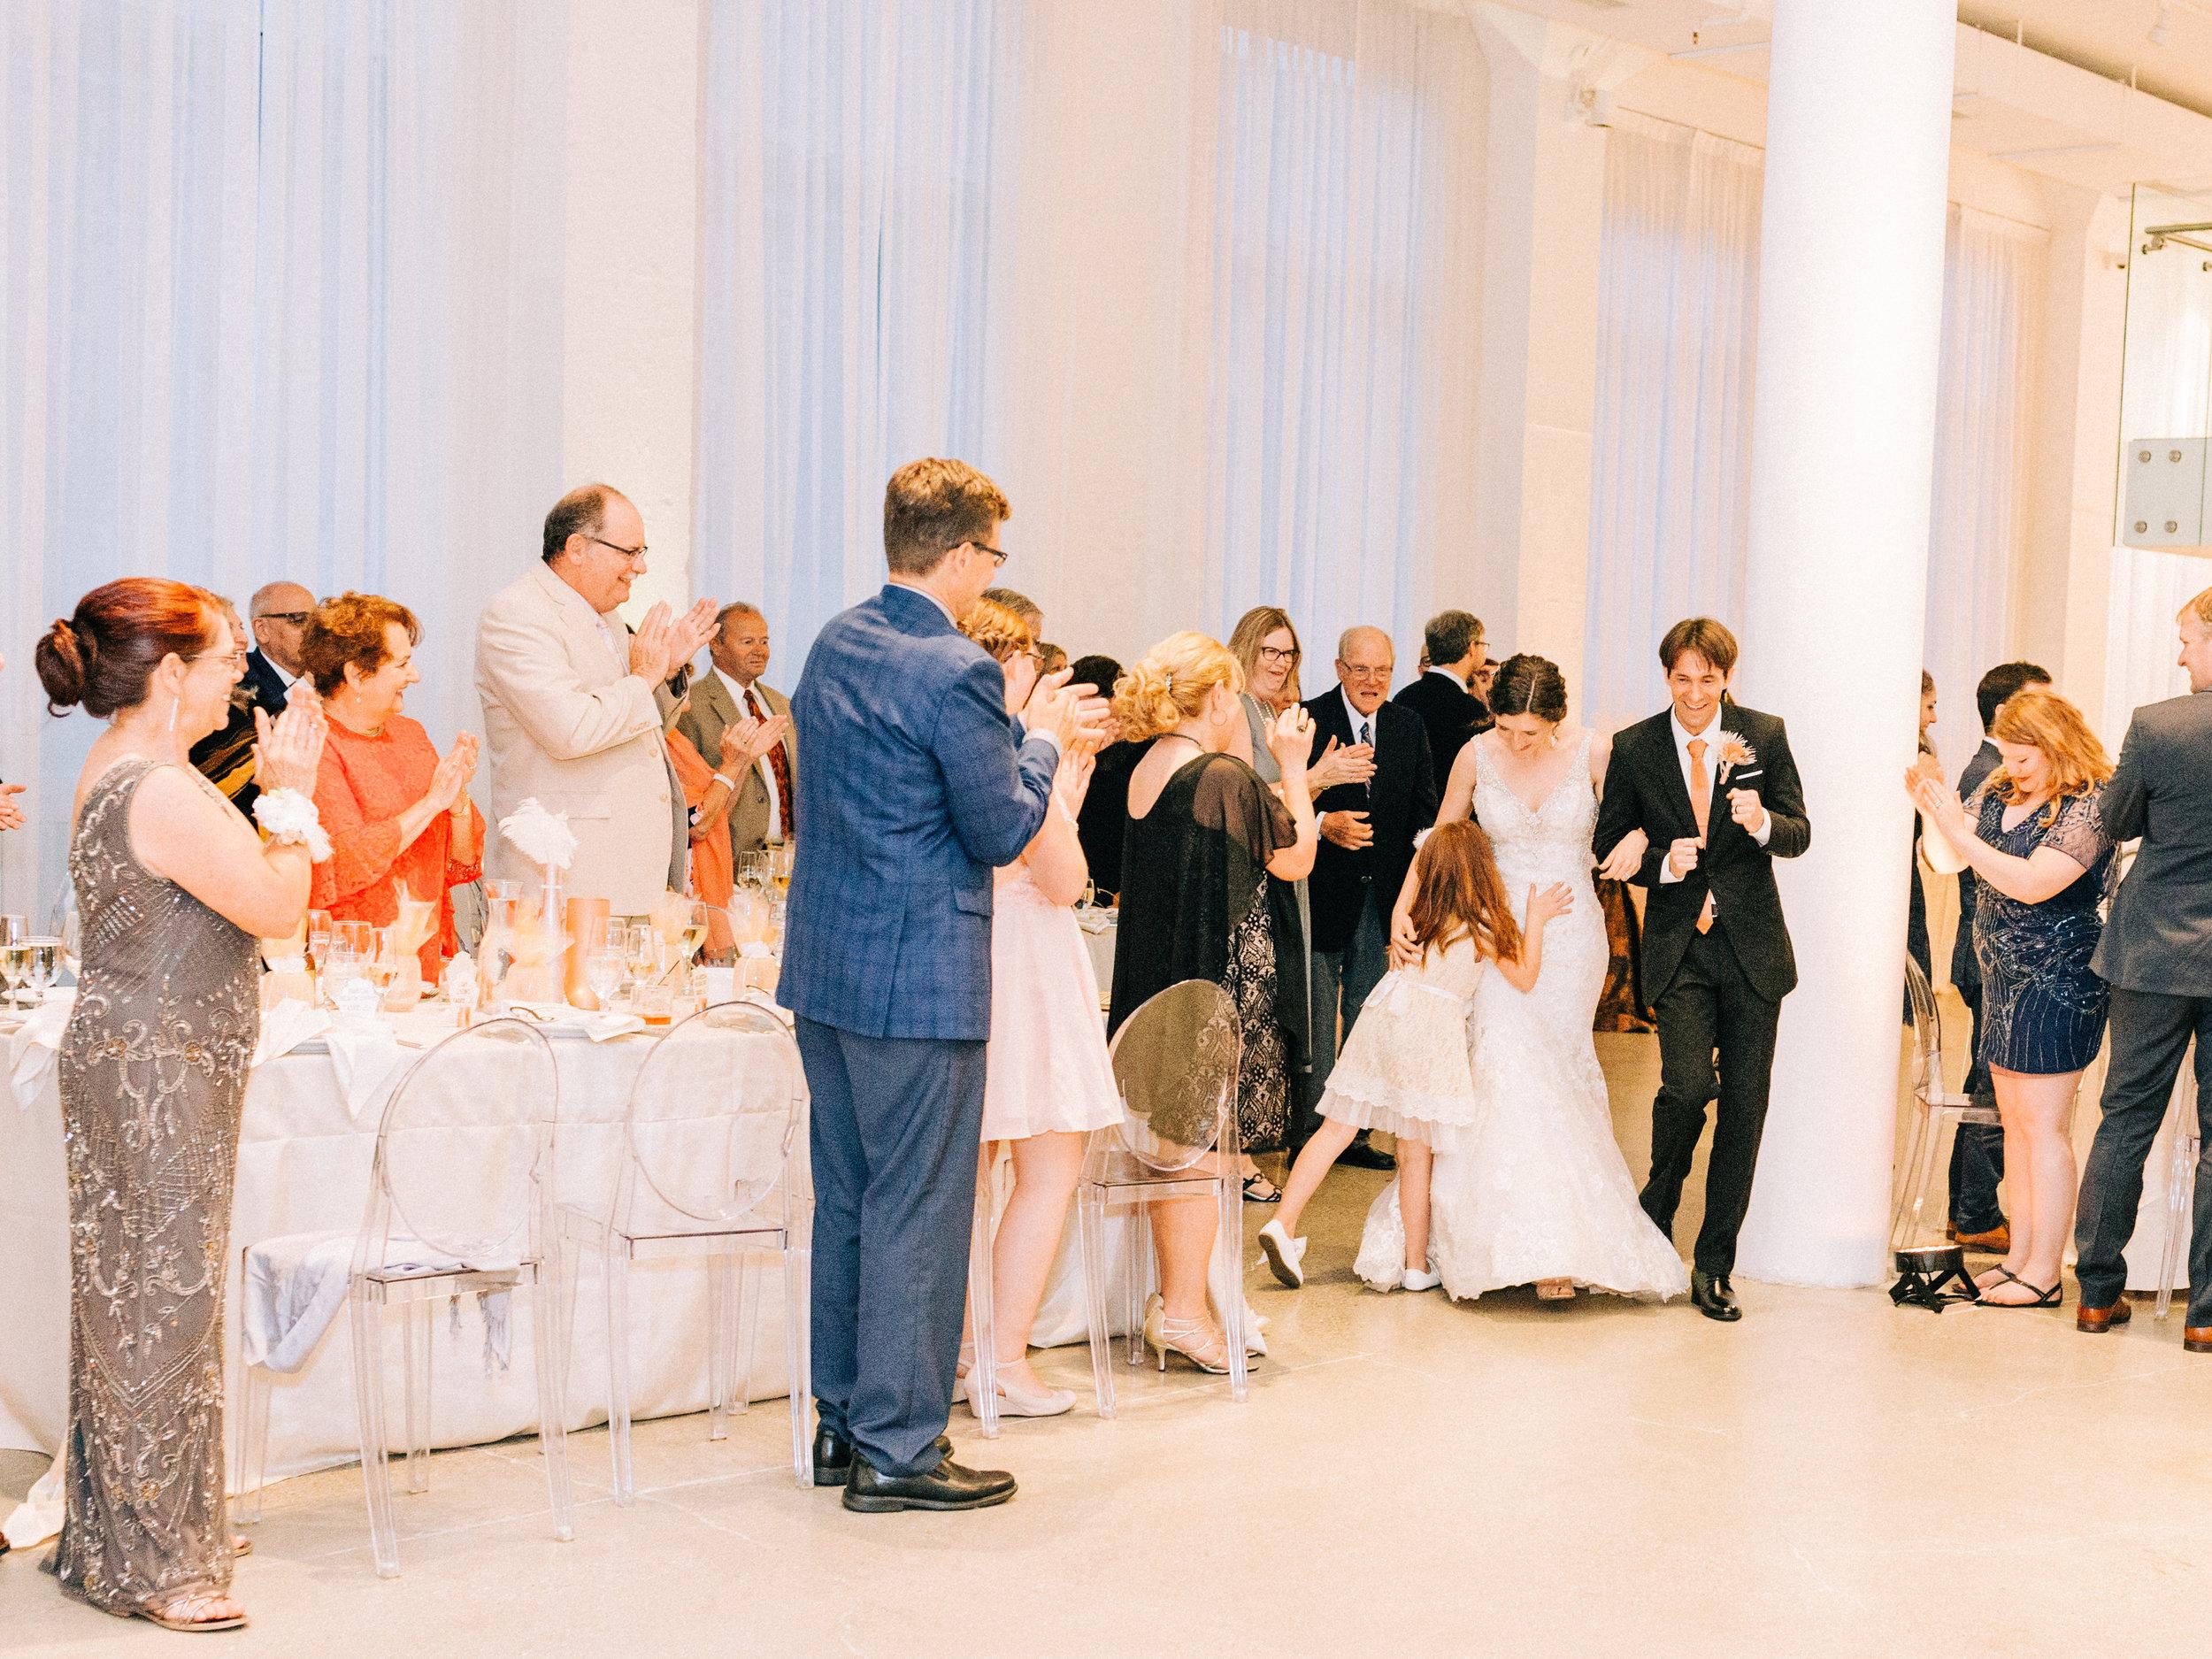 Dorothy_Louise_Photography_University_of_Chicago_Chapel_Wedding-99.jpg